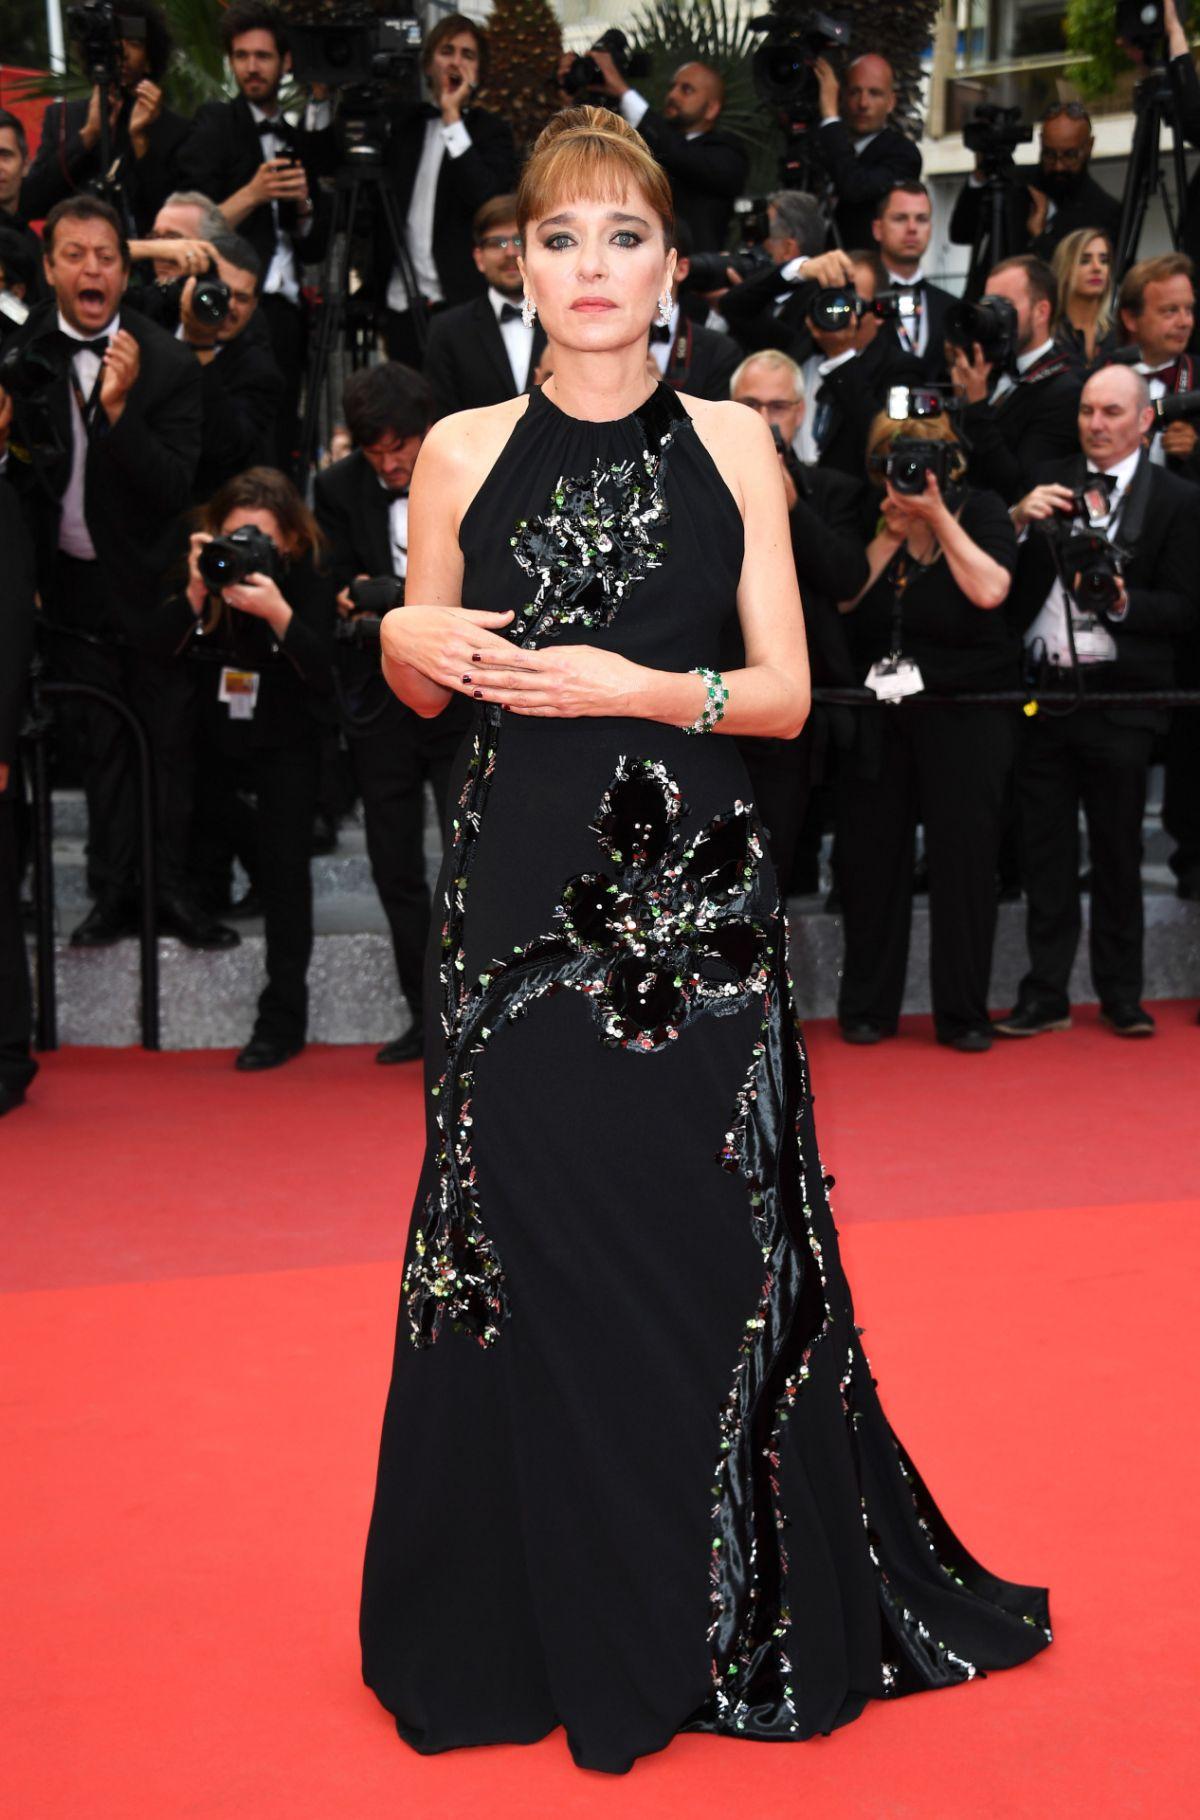 VALERIA GOLINO at 69th Annual Cannes Film Festival Closing Ceremony 05/22/2016